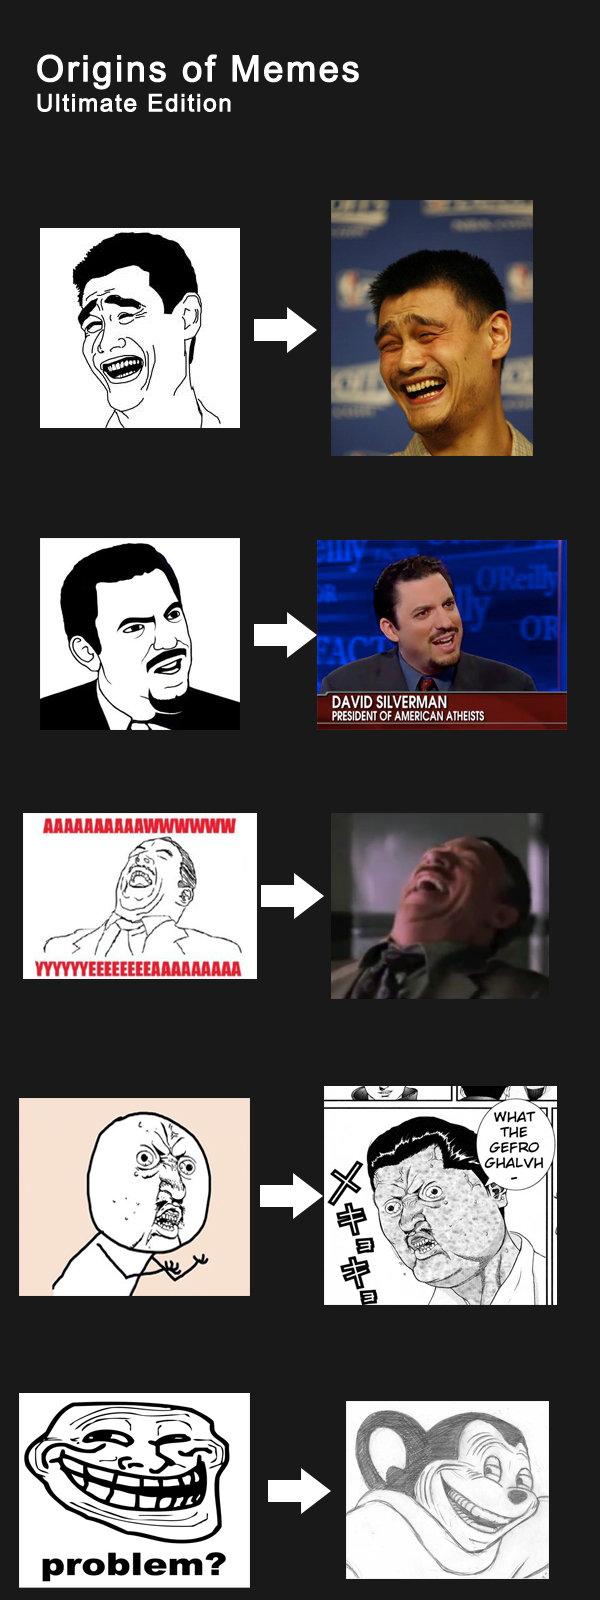 "Origin of Memes. . Origins of Memes Ultimate Edition DAVE) SILVERKA PERSIDENT In AMERICA problem?. ""Ultimate Edition""= 5 memes origin of MEMES"